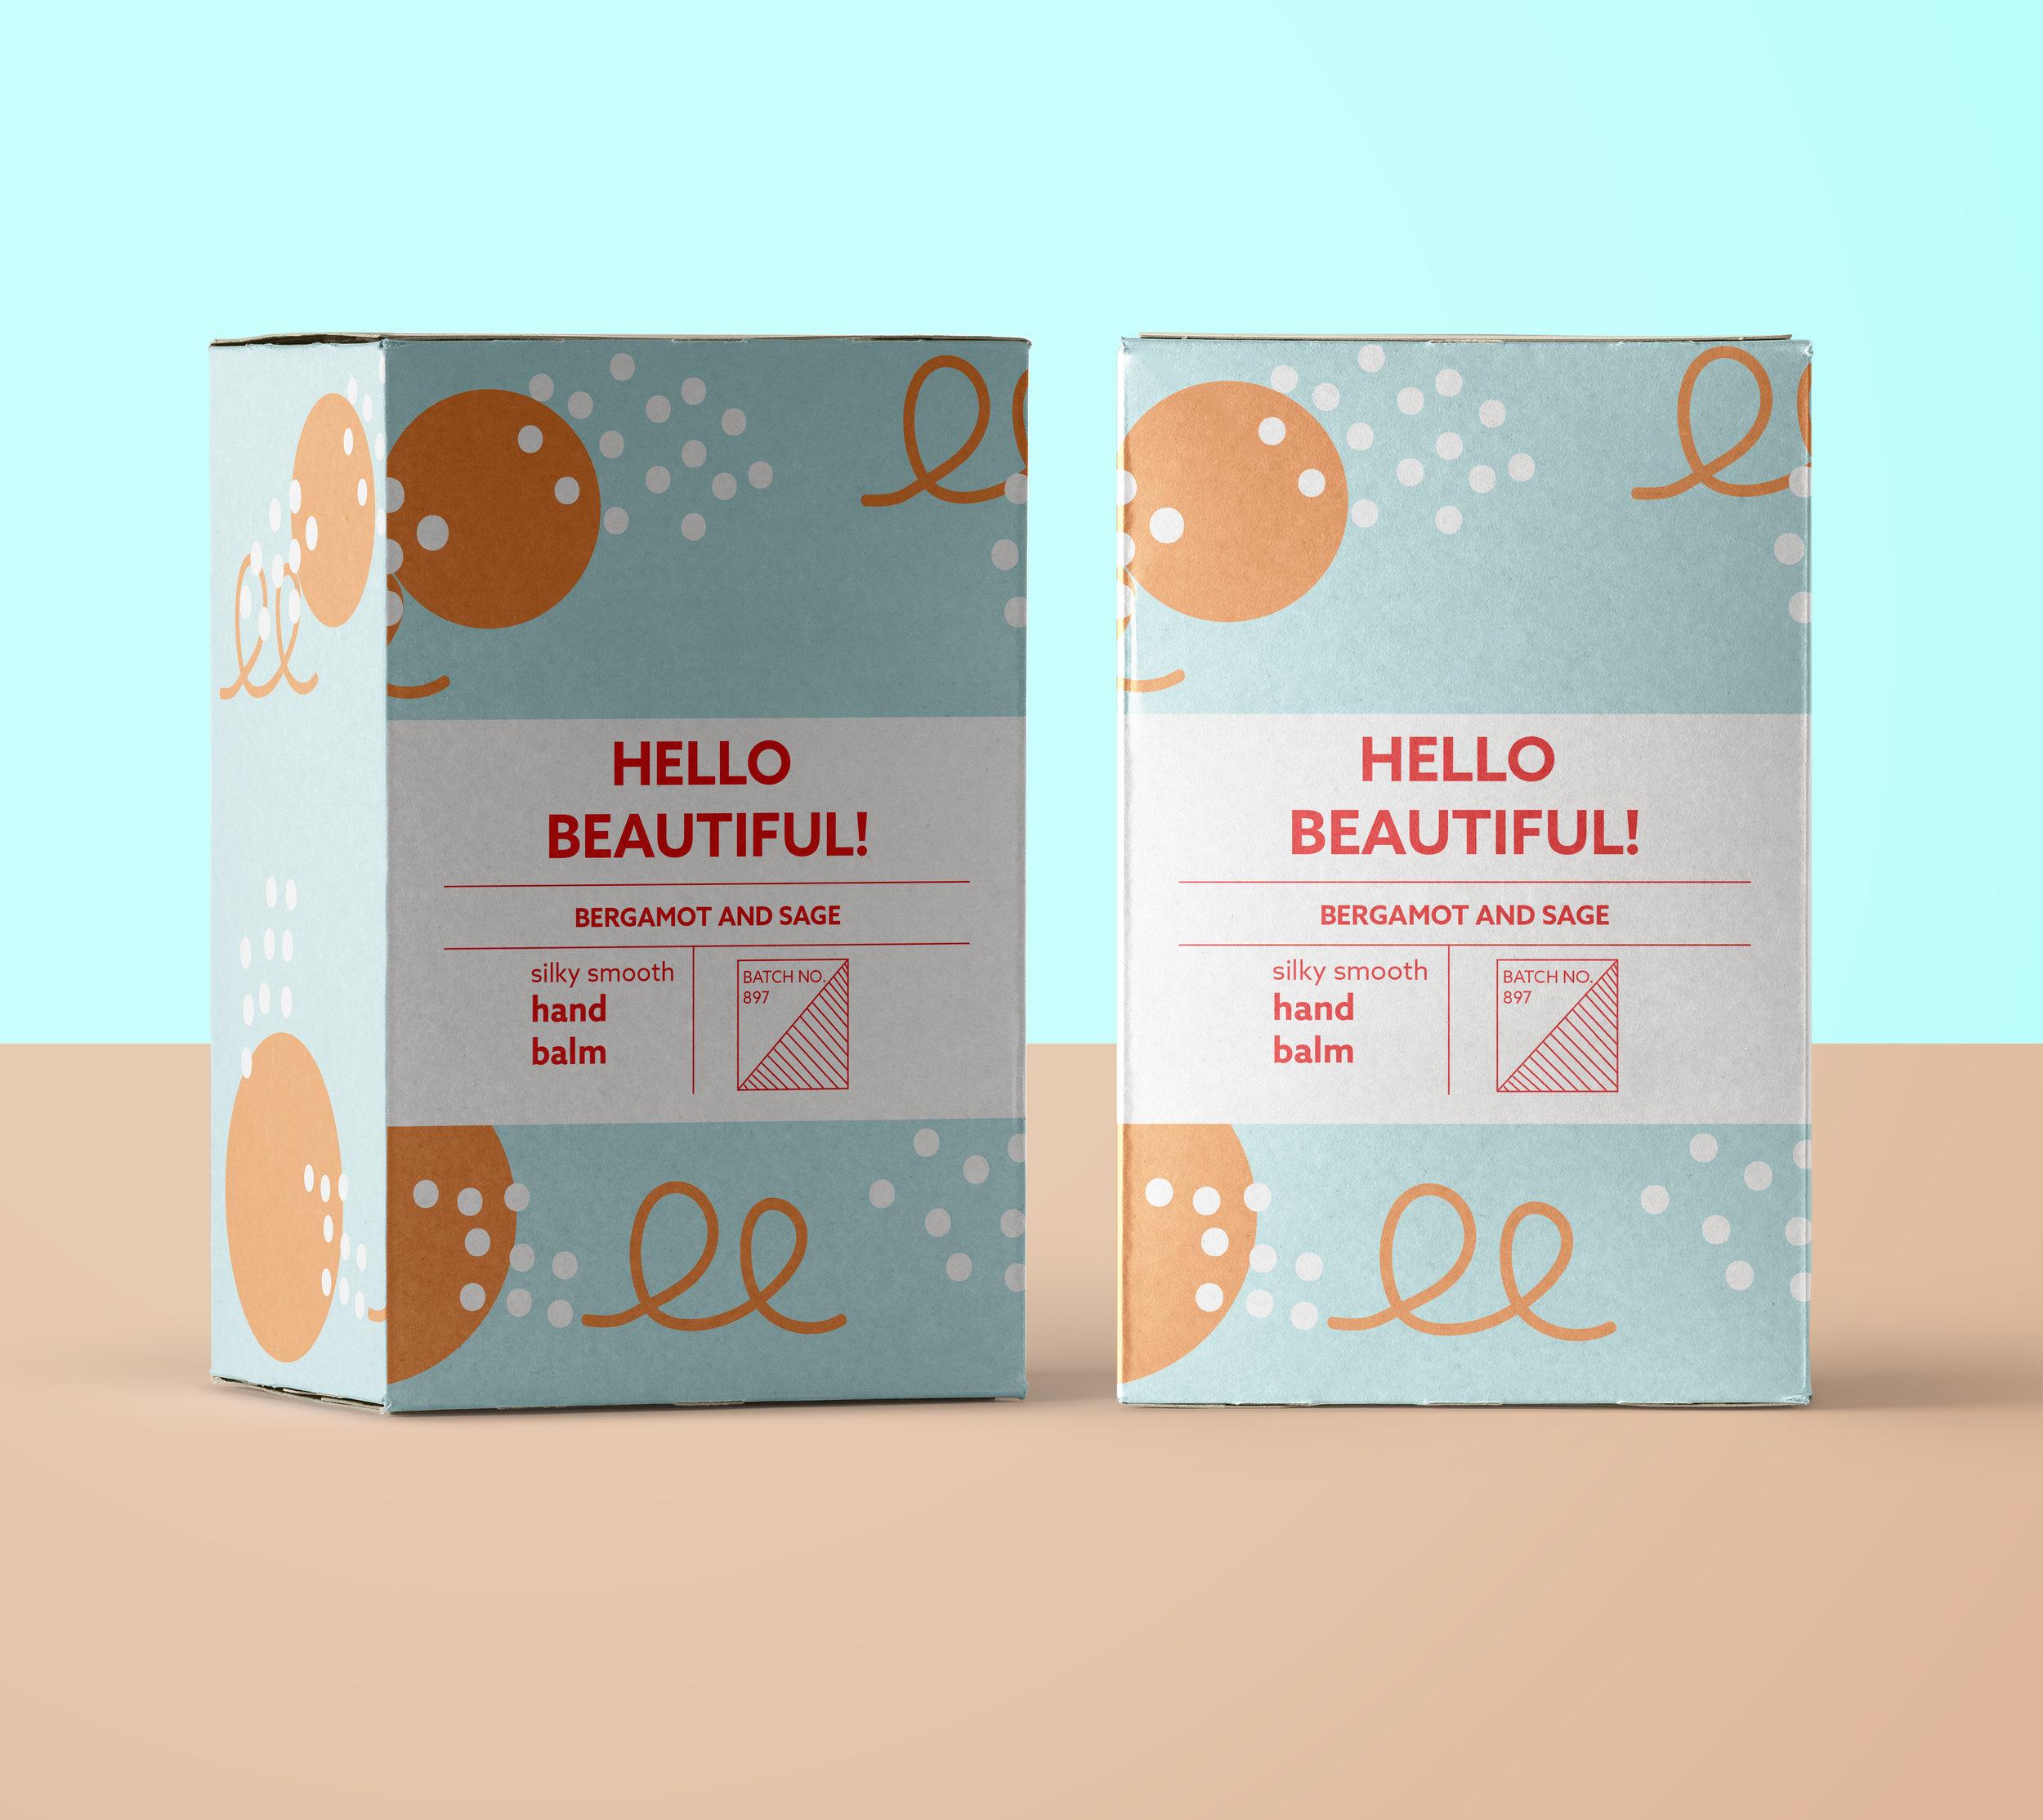 HelloBeautifulBlue.jpg